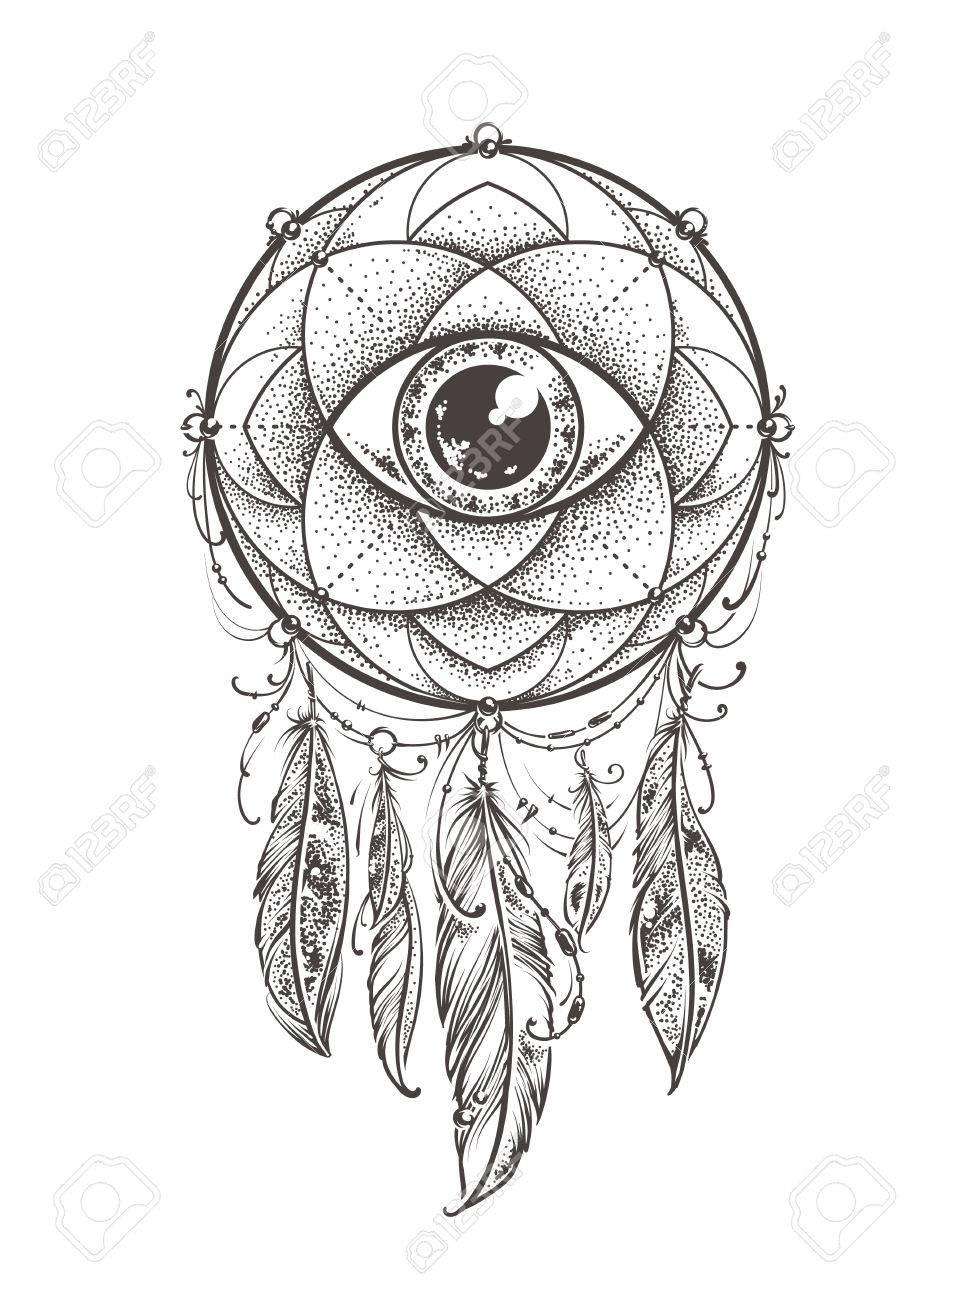 Abstract Art Of Original Dream Catcher Symbol Geometric Pattern